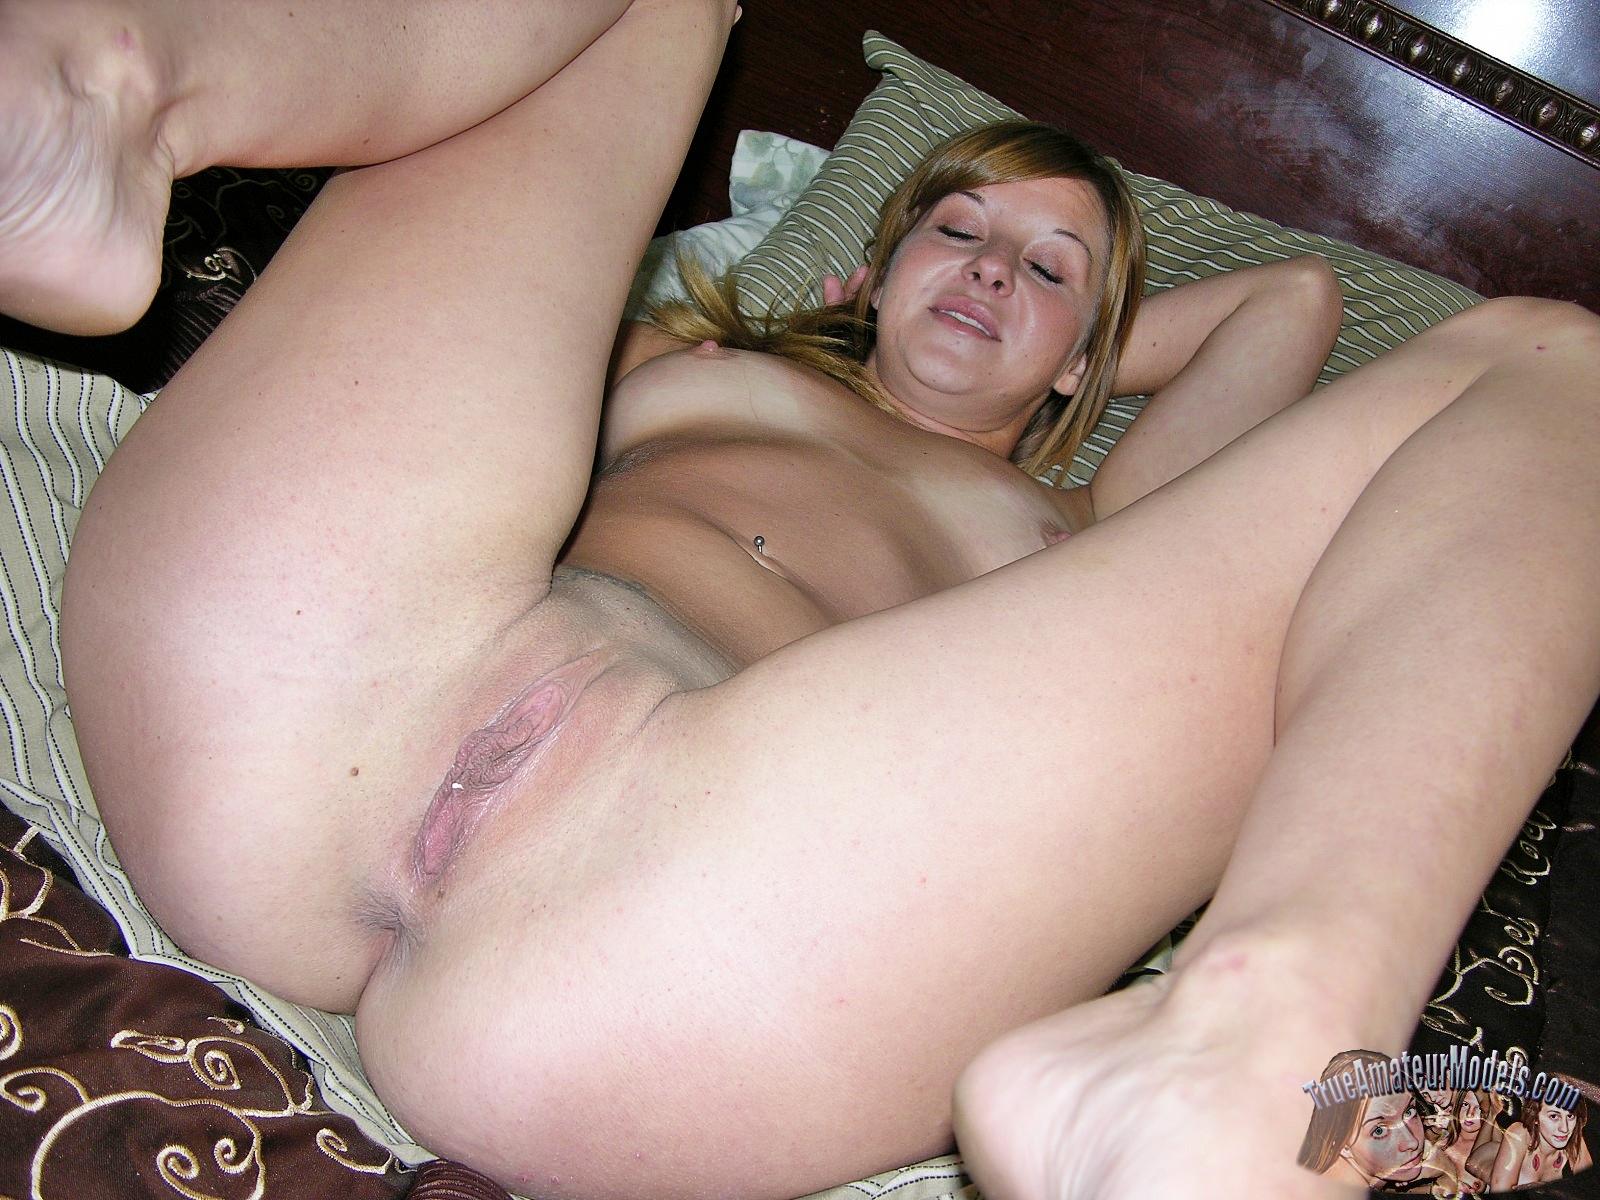 Pussy nude amateur picture album model net hardcore movie